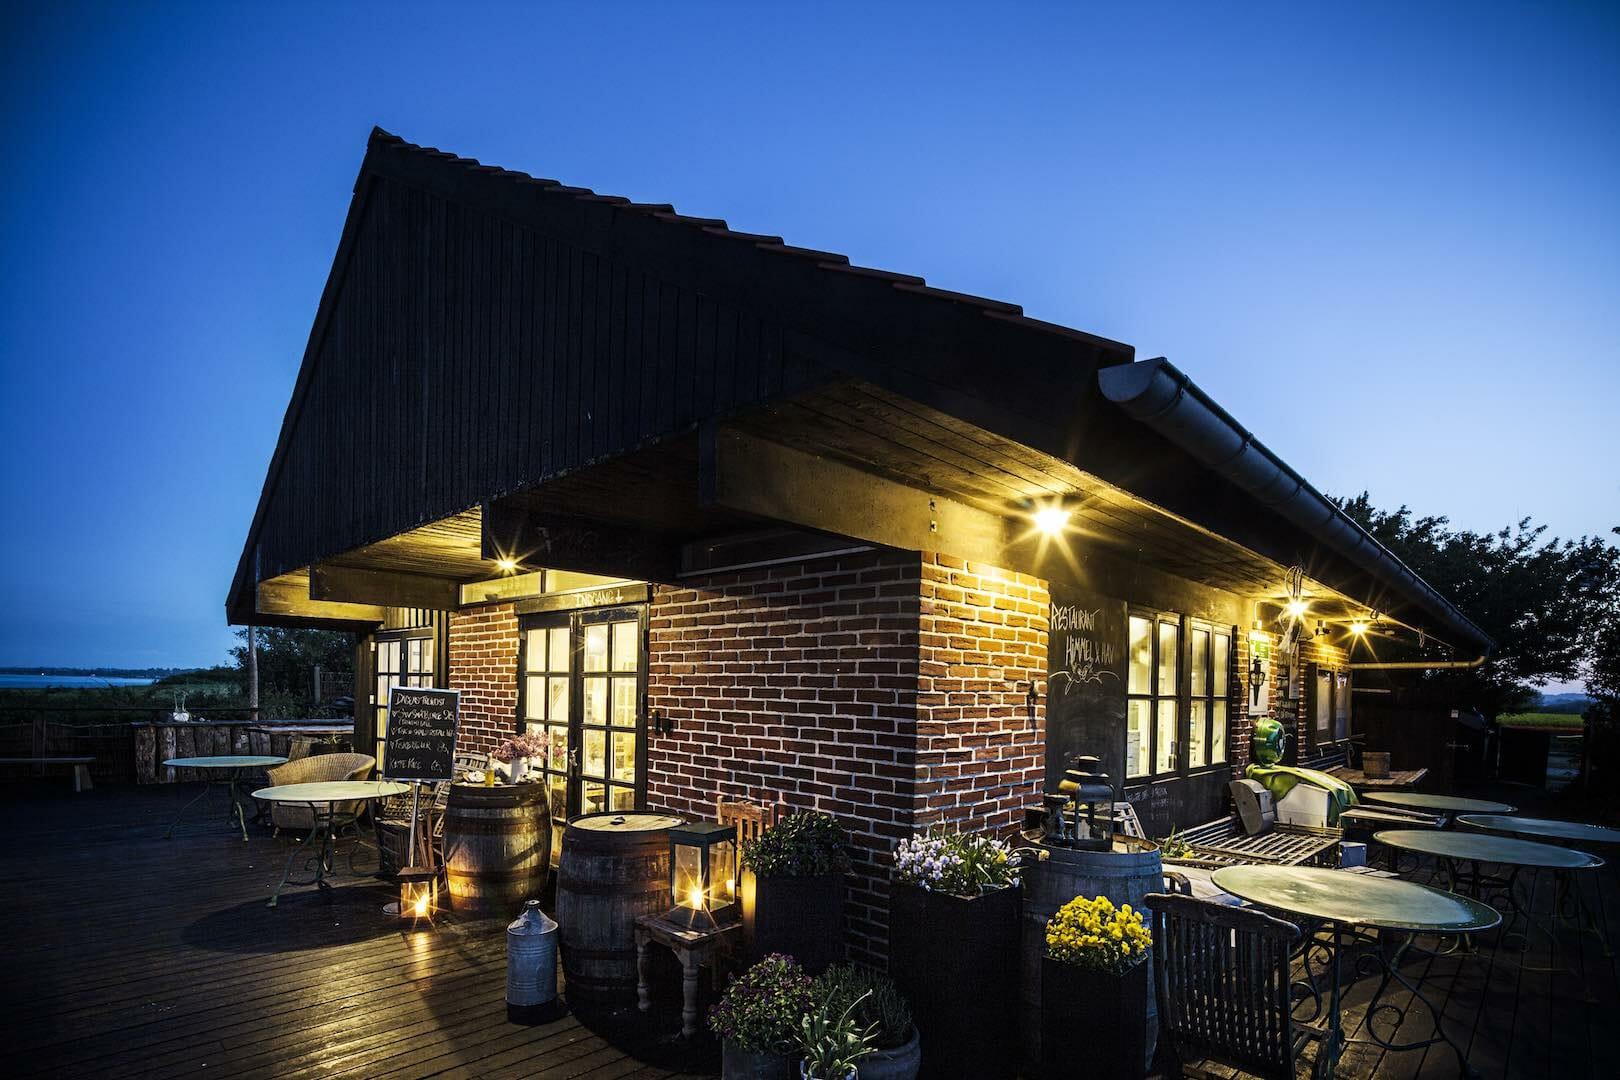 Restaurant Himmel & Hav - foto: Jesper Rais, www.raisfoto.dk